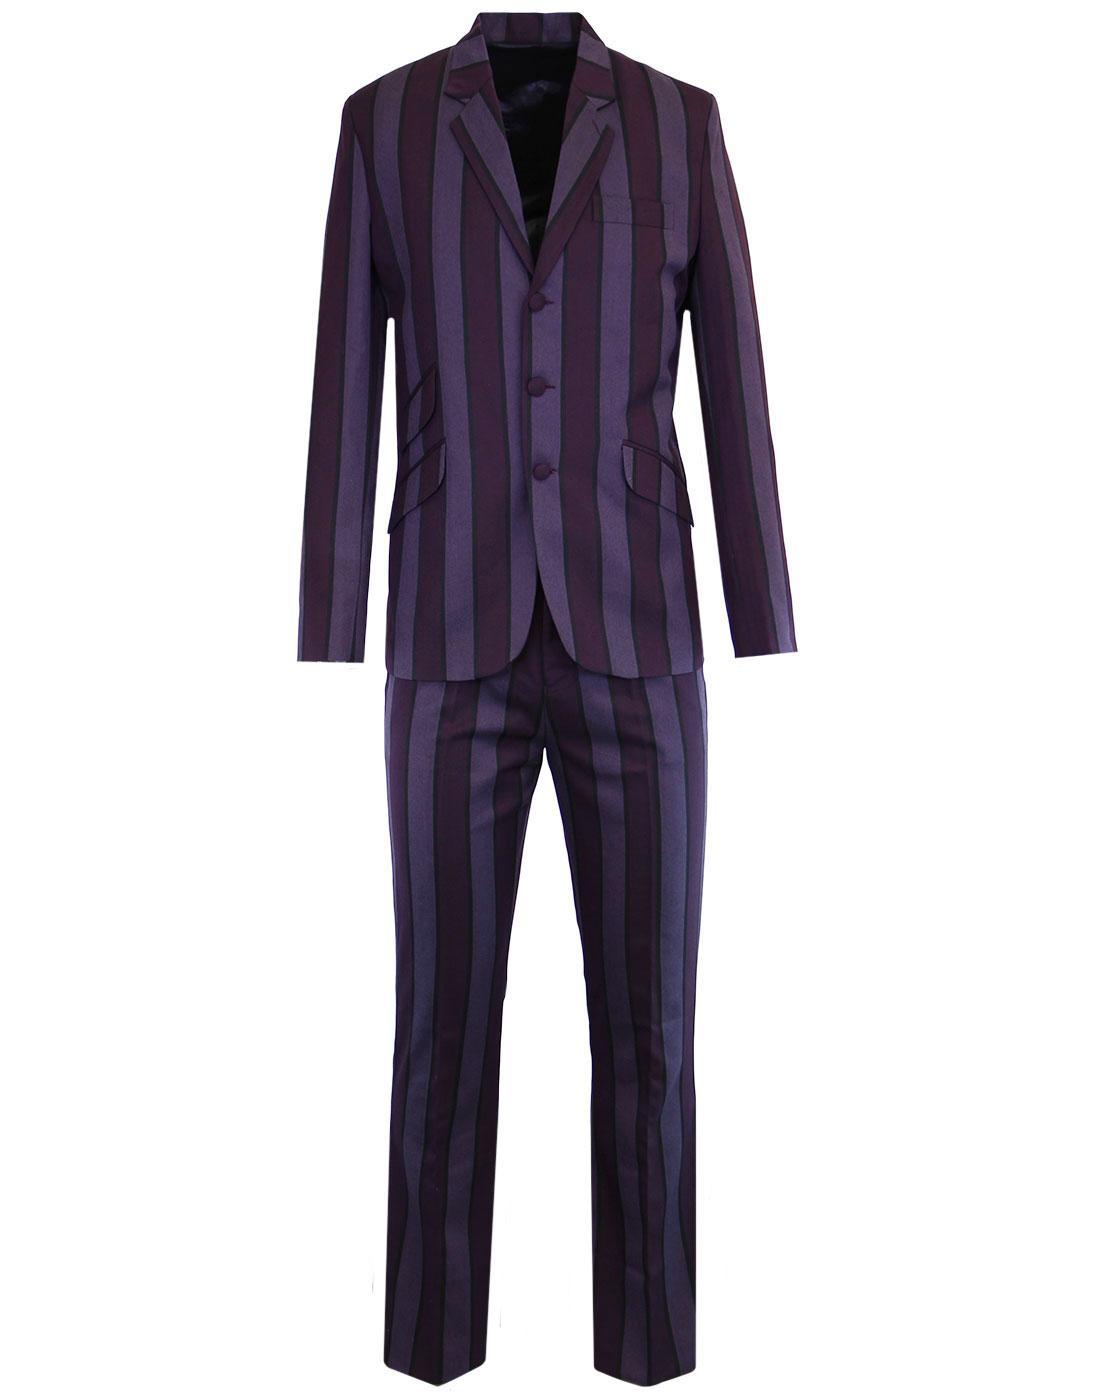 MADCAP ENGLAND Offbeat Mod 60s Slim Suit in Purple